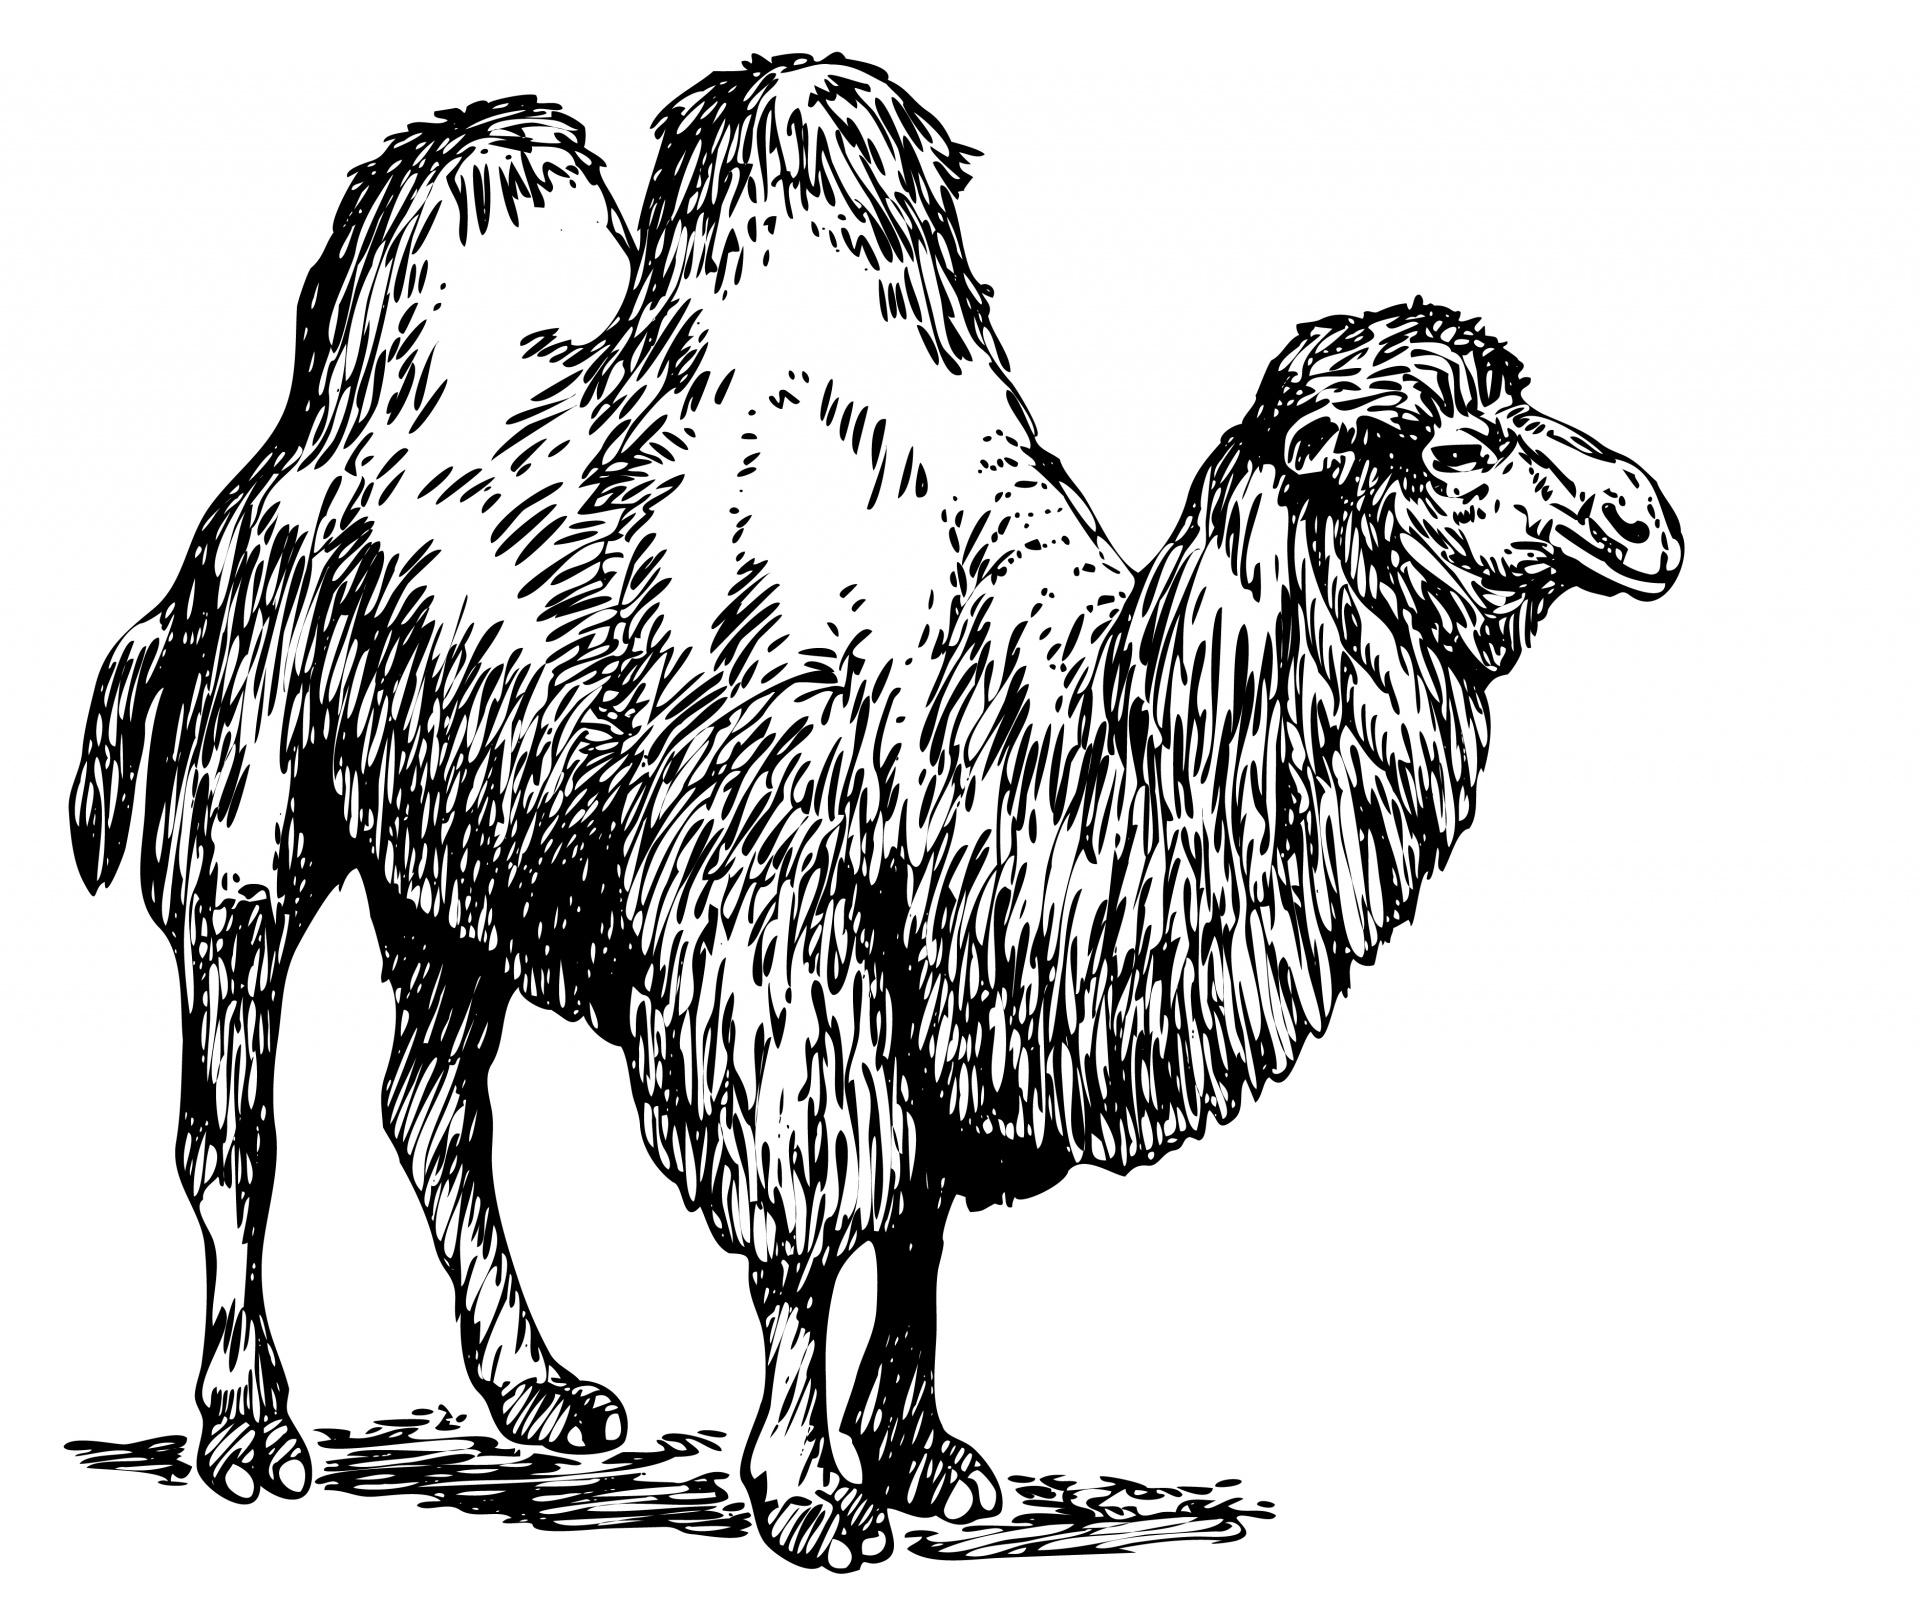 Camel clipart bactrian camel. Illustration free stock photo